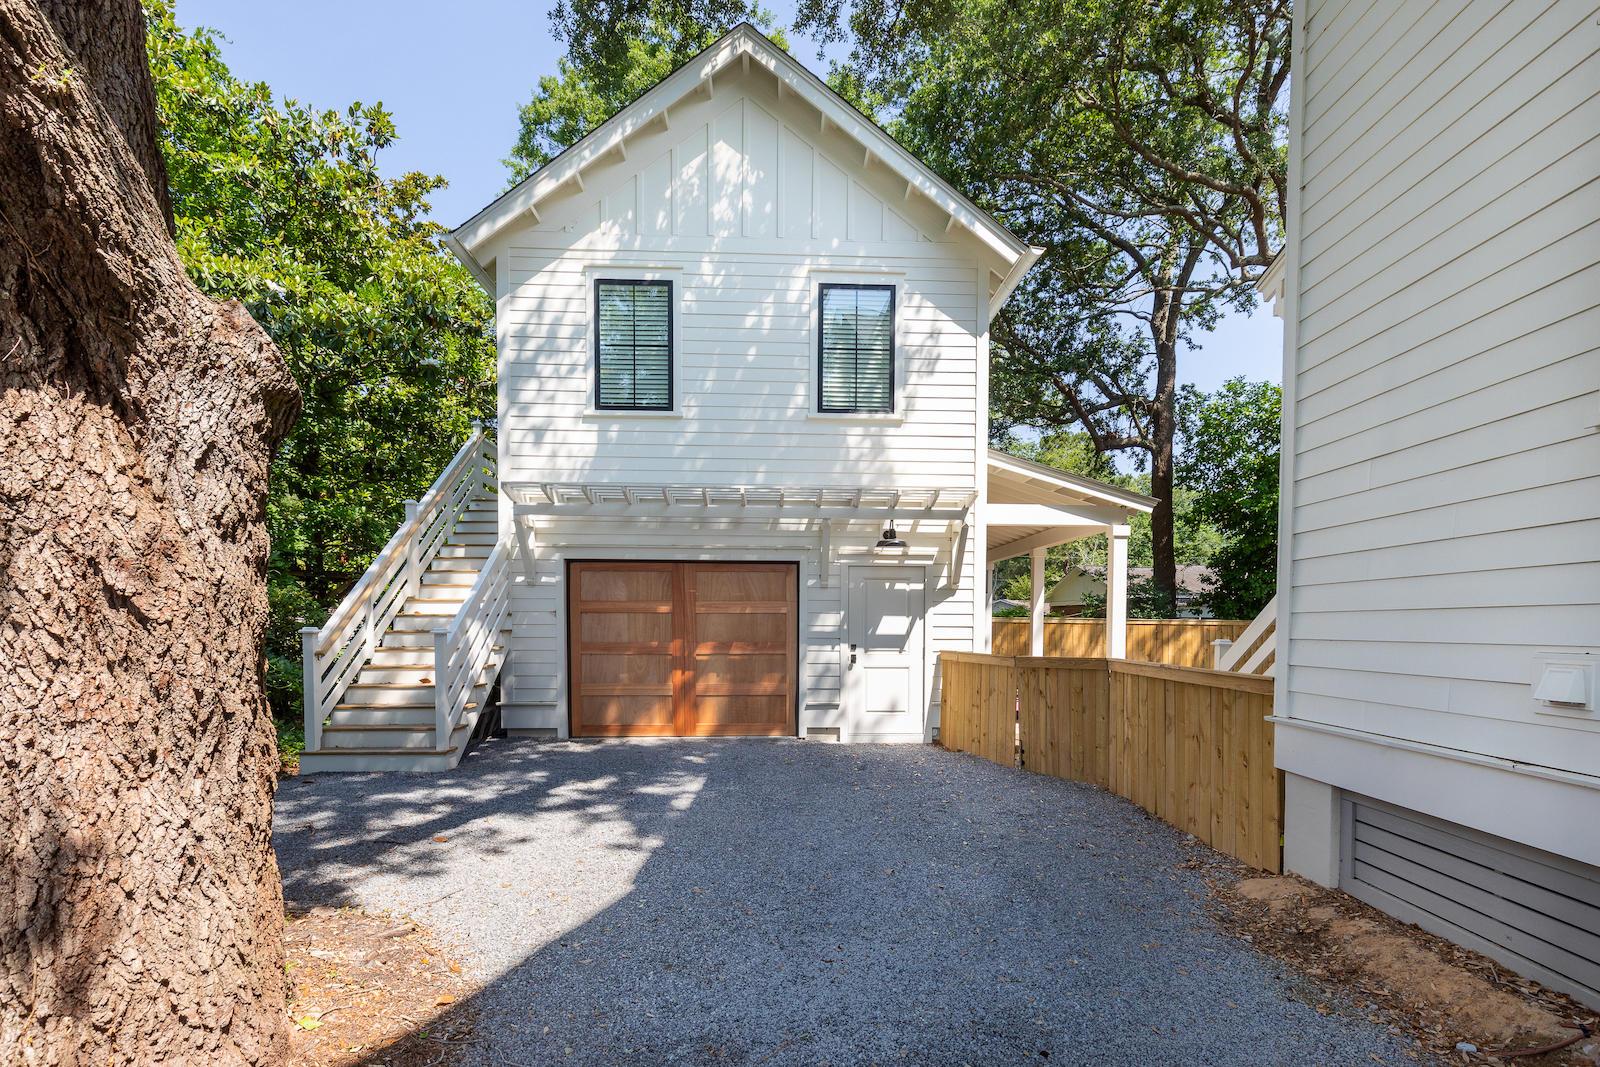 Old Mt Pleasant Homes For Sale - 546 Center, Mount Pleasant, SC - 33